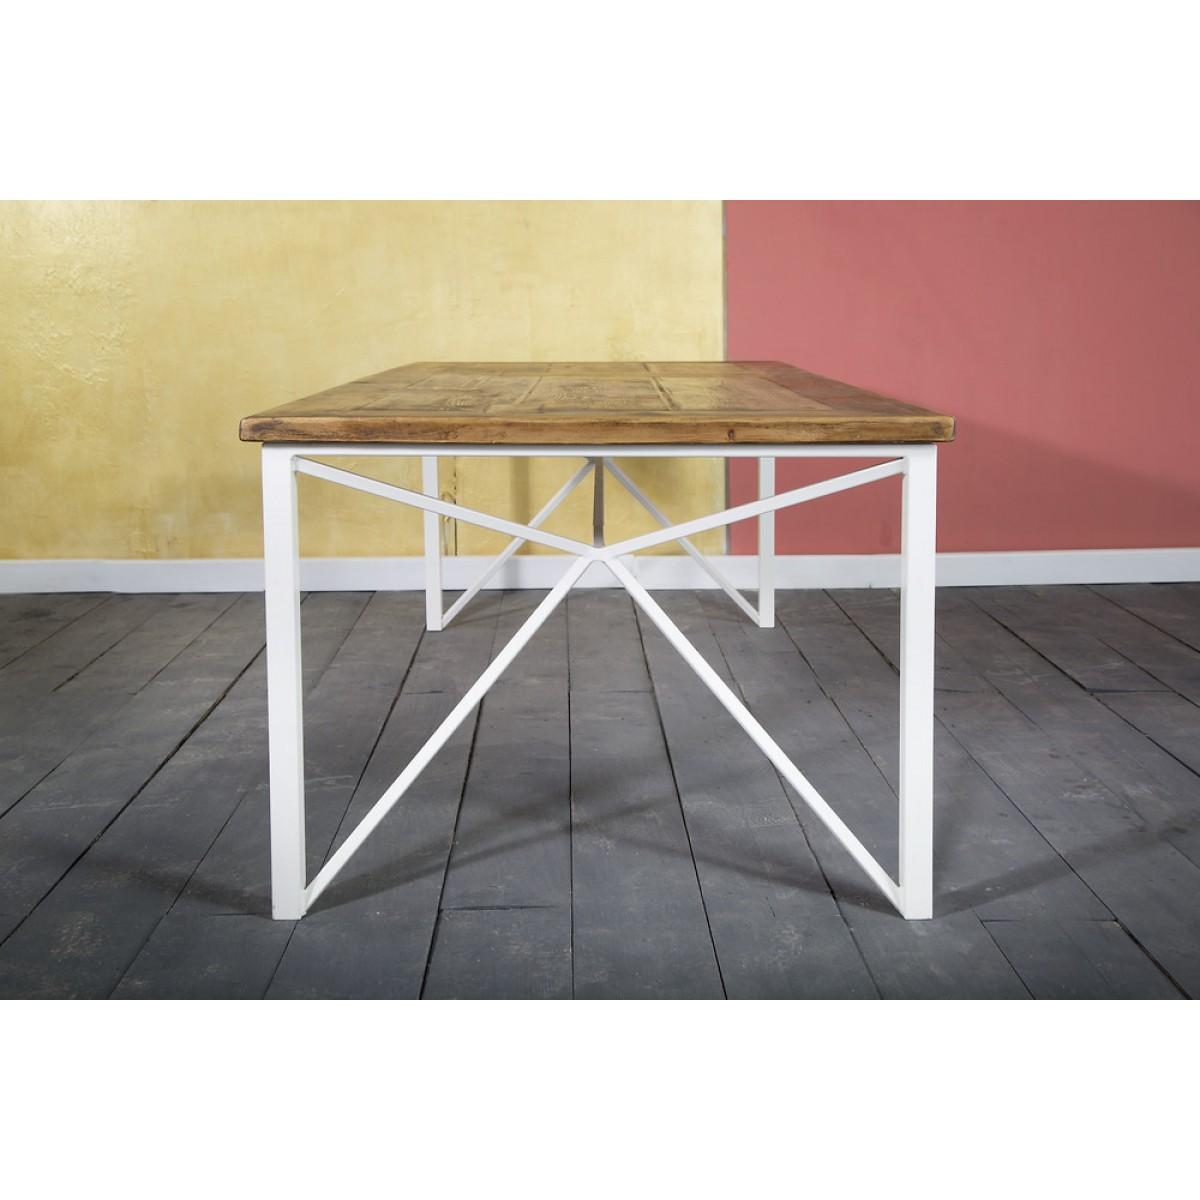 C - 100 x 200 cm, Tisch Donoe * SALE